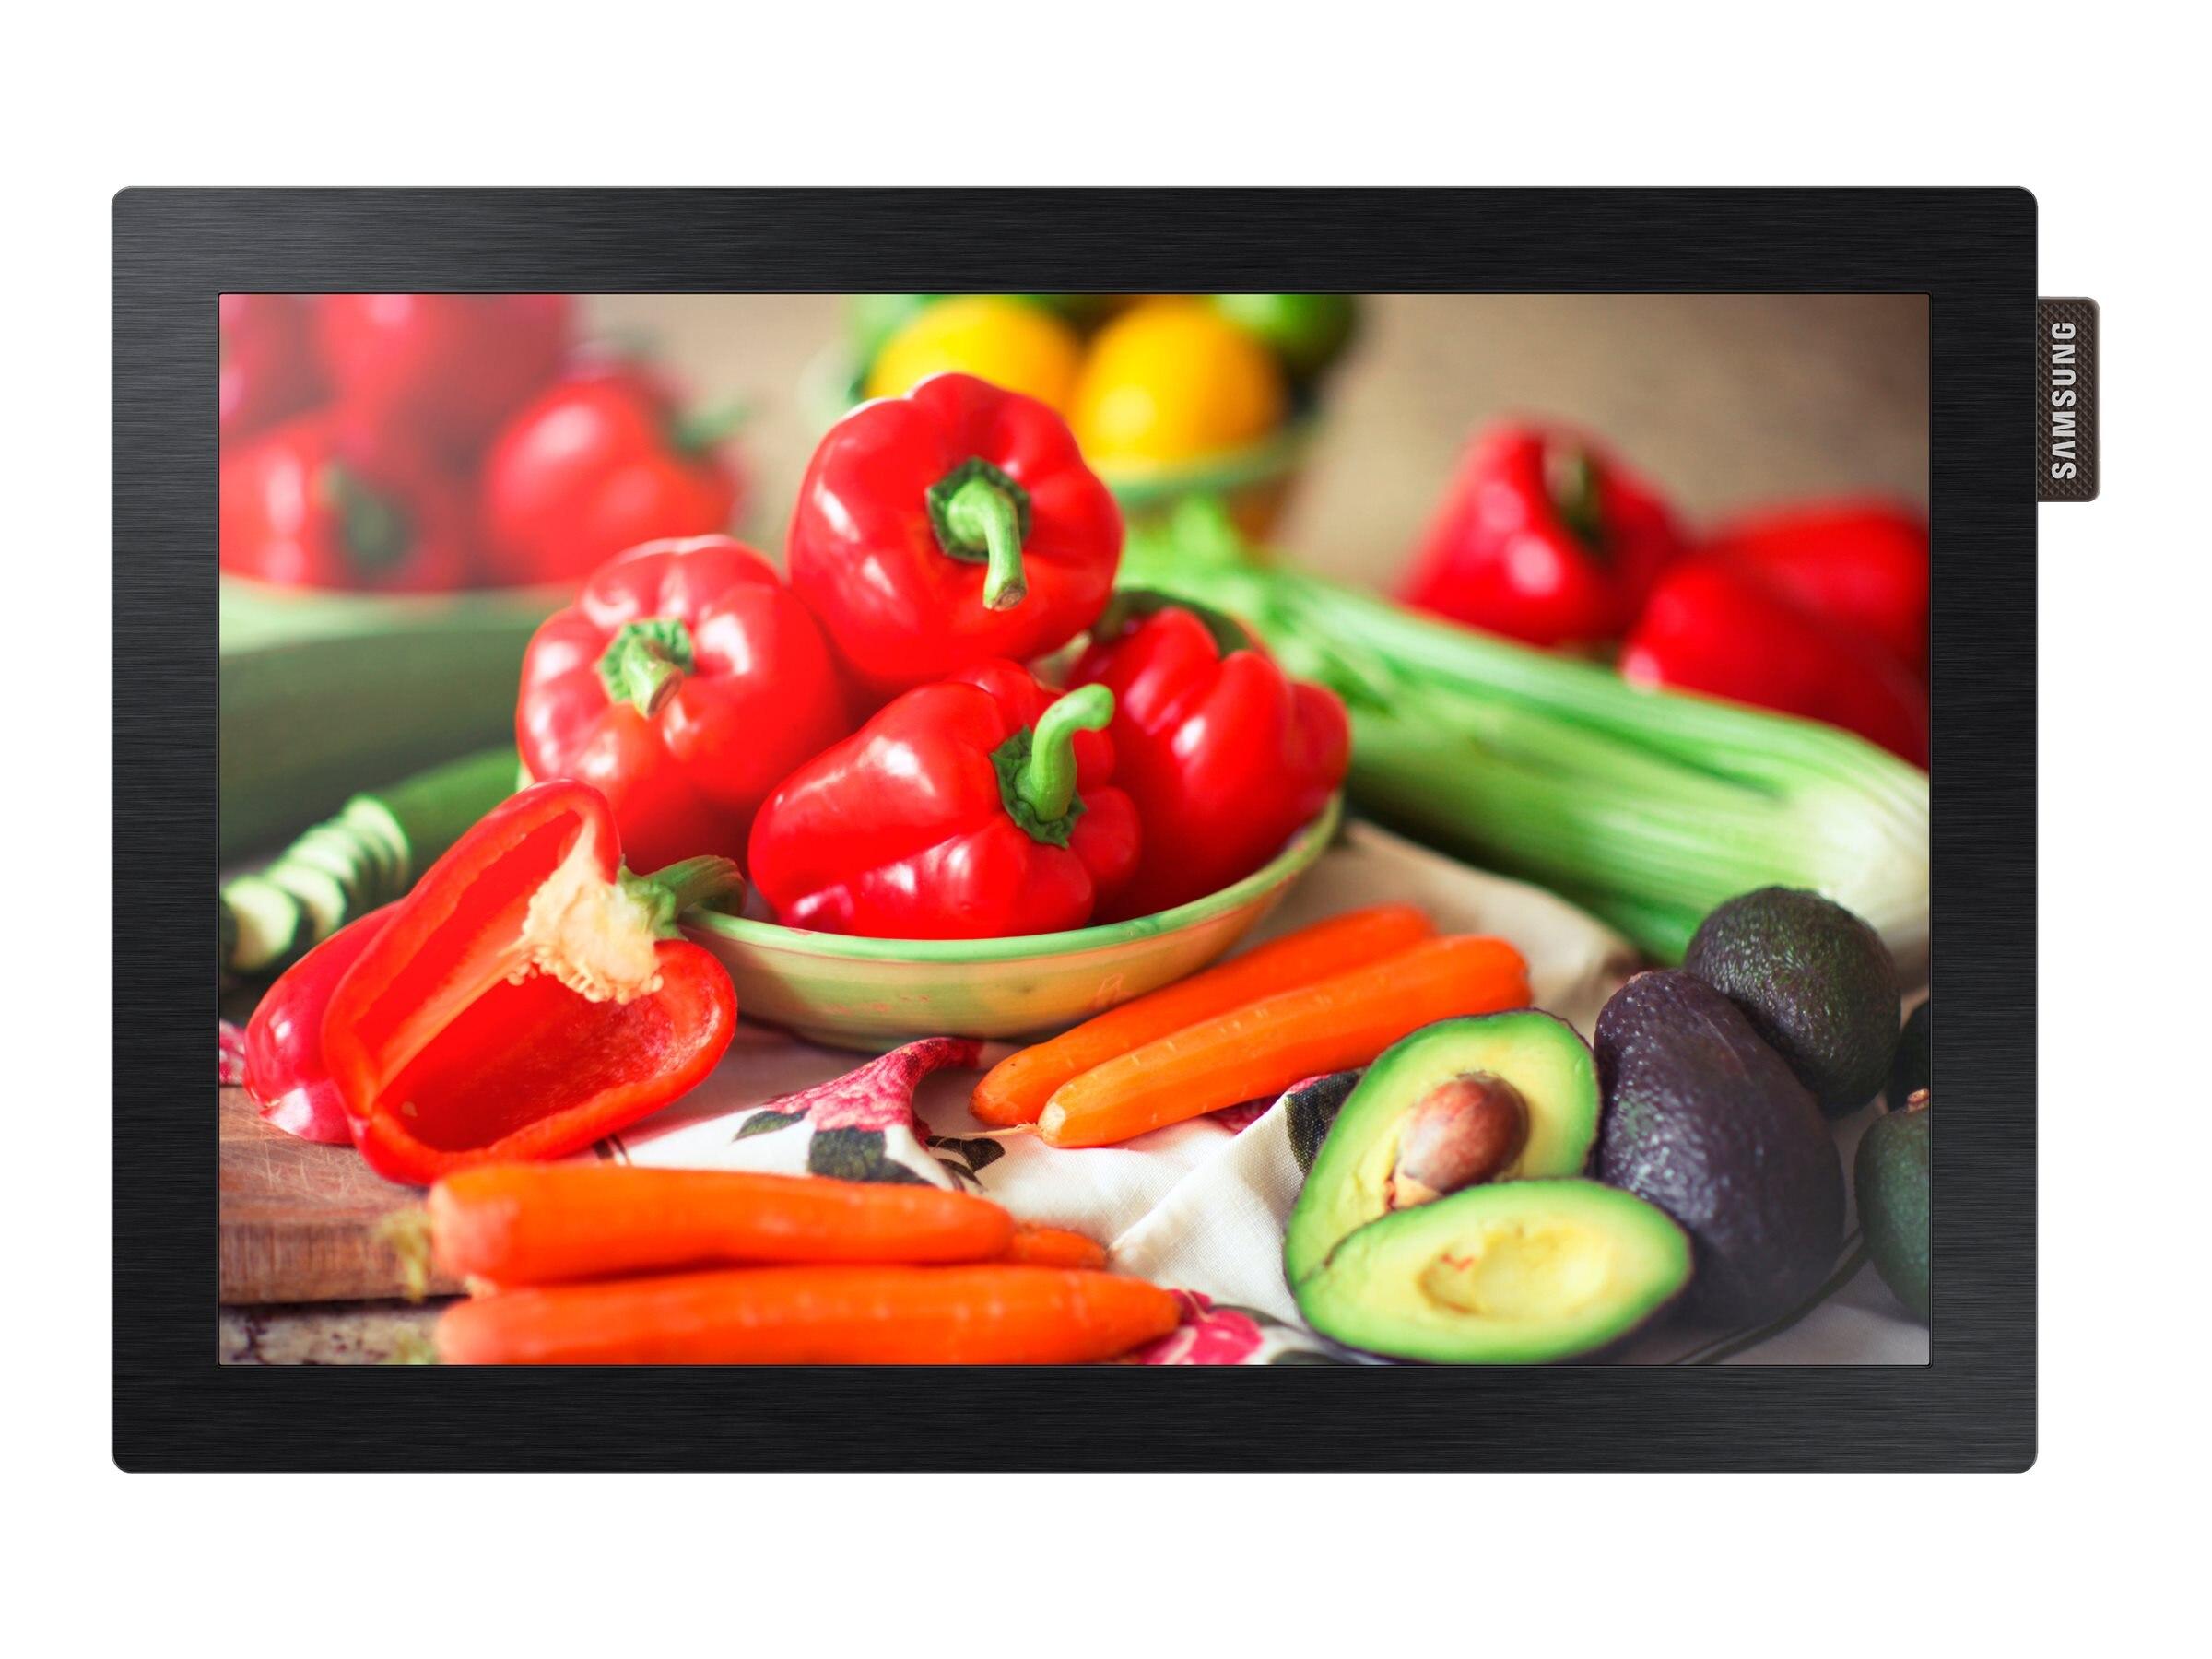 Samsung 10.1 DB10D LED-LCD Display, Black, DB10D, 18124781, Digital Signage Systems & Modules